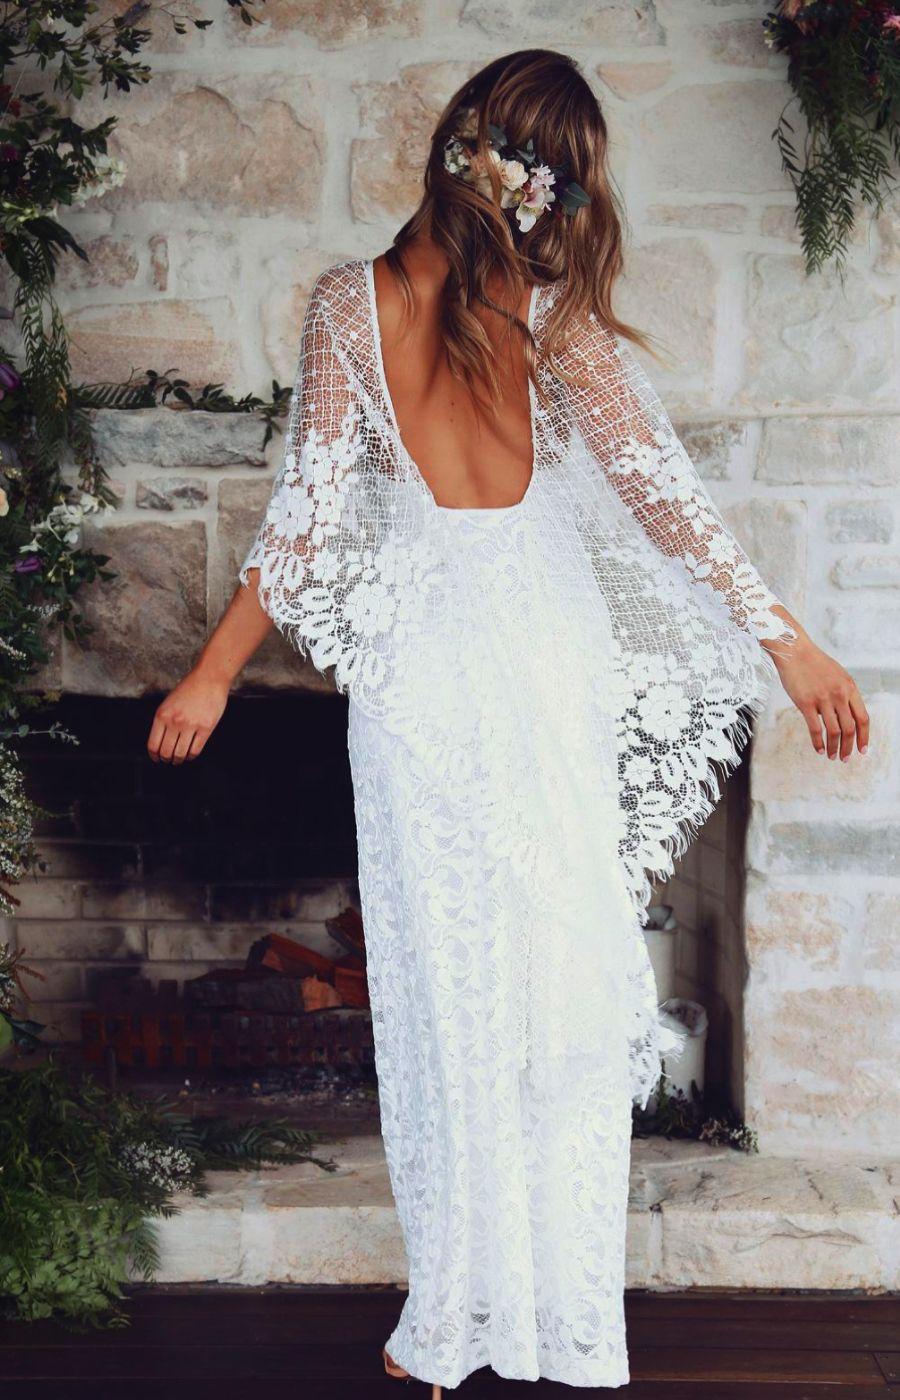 Verdelle grace loves lace boho wedding dresses boho wedding